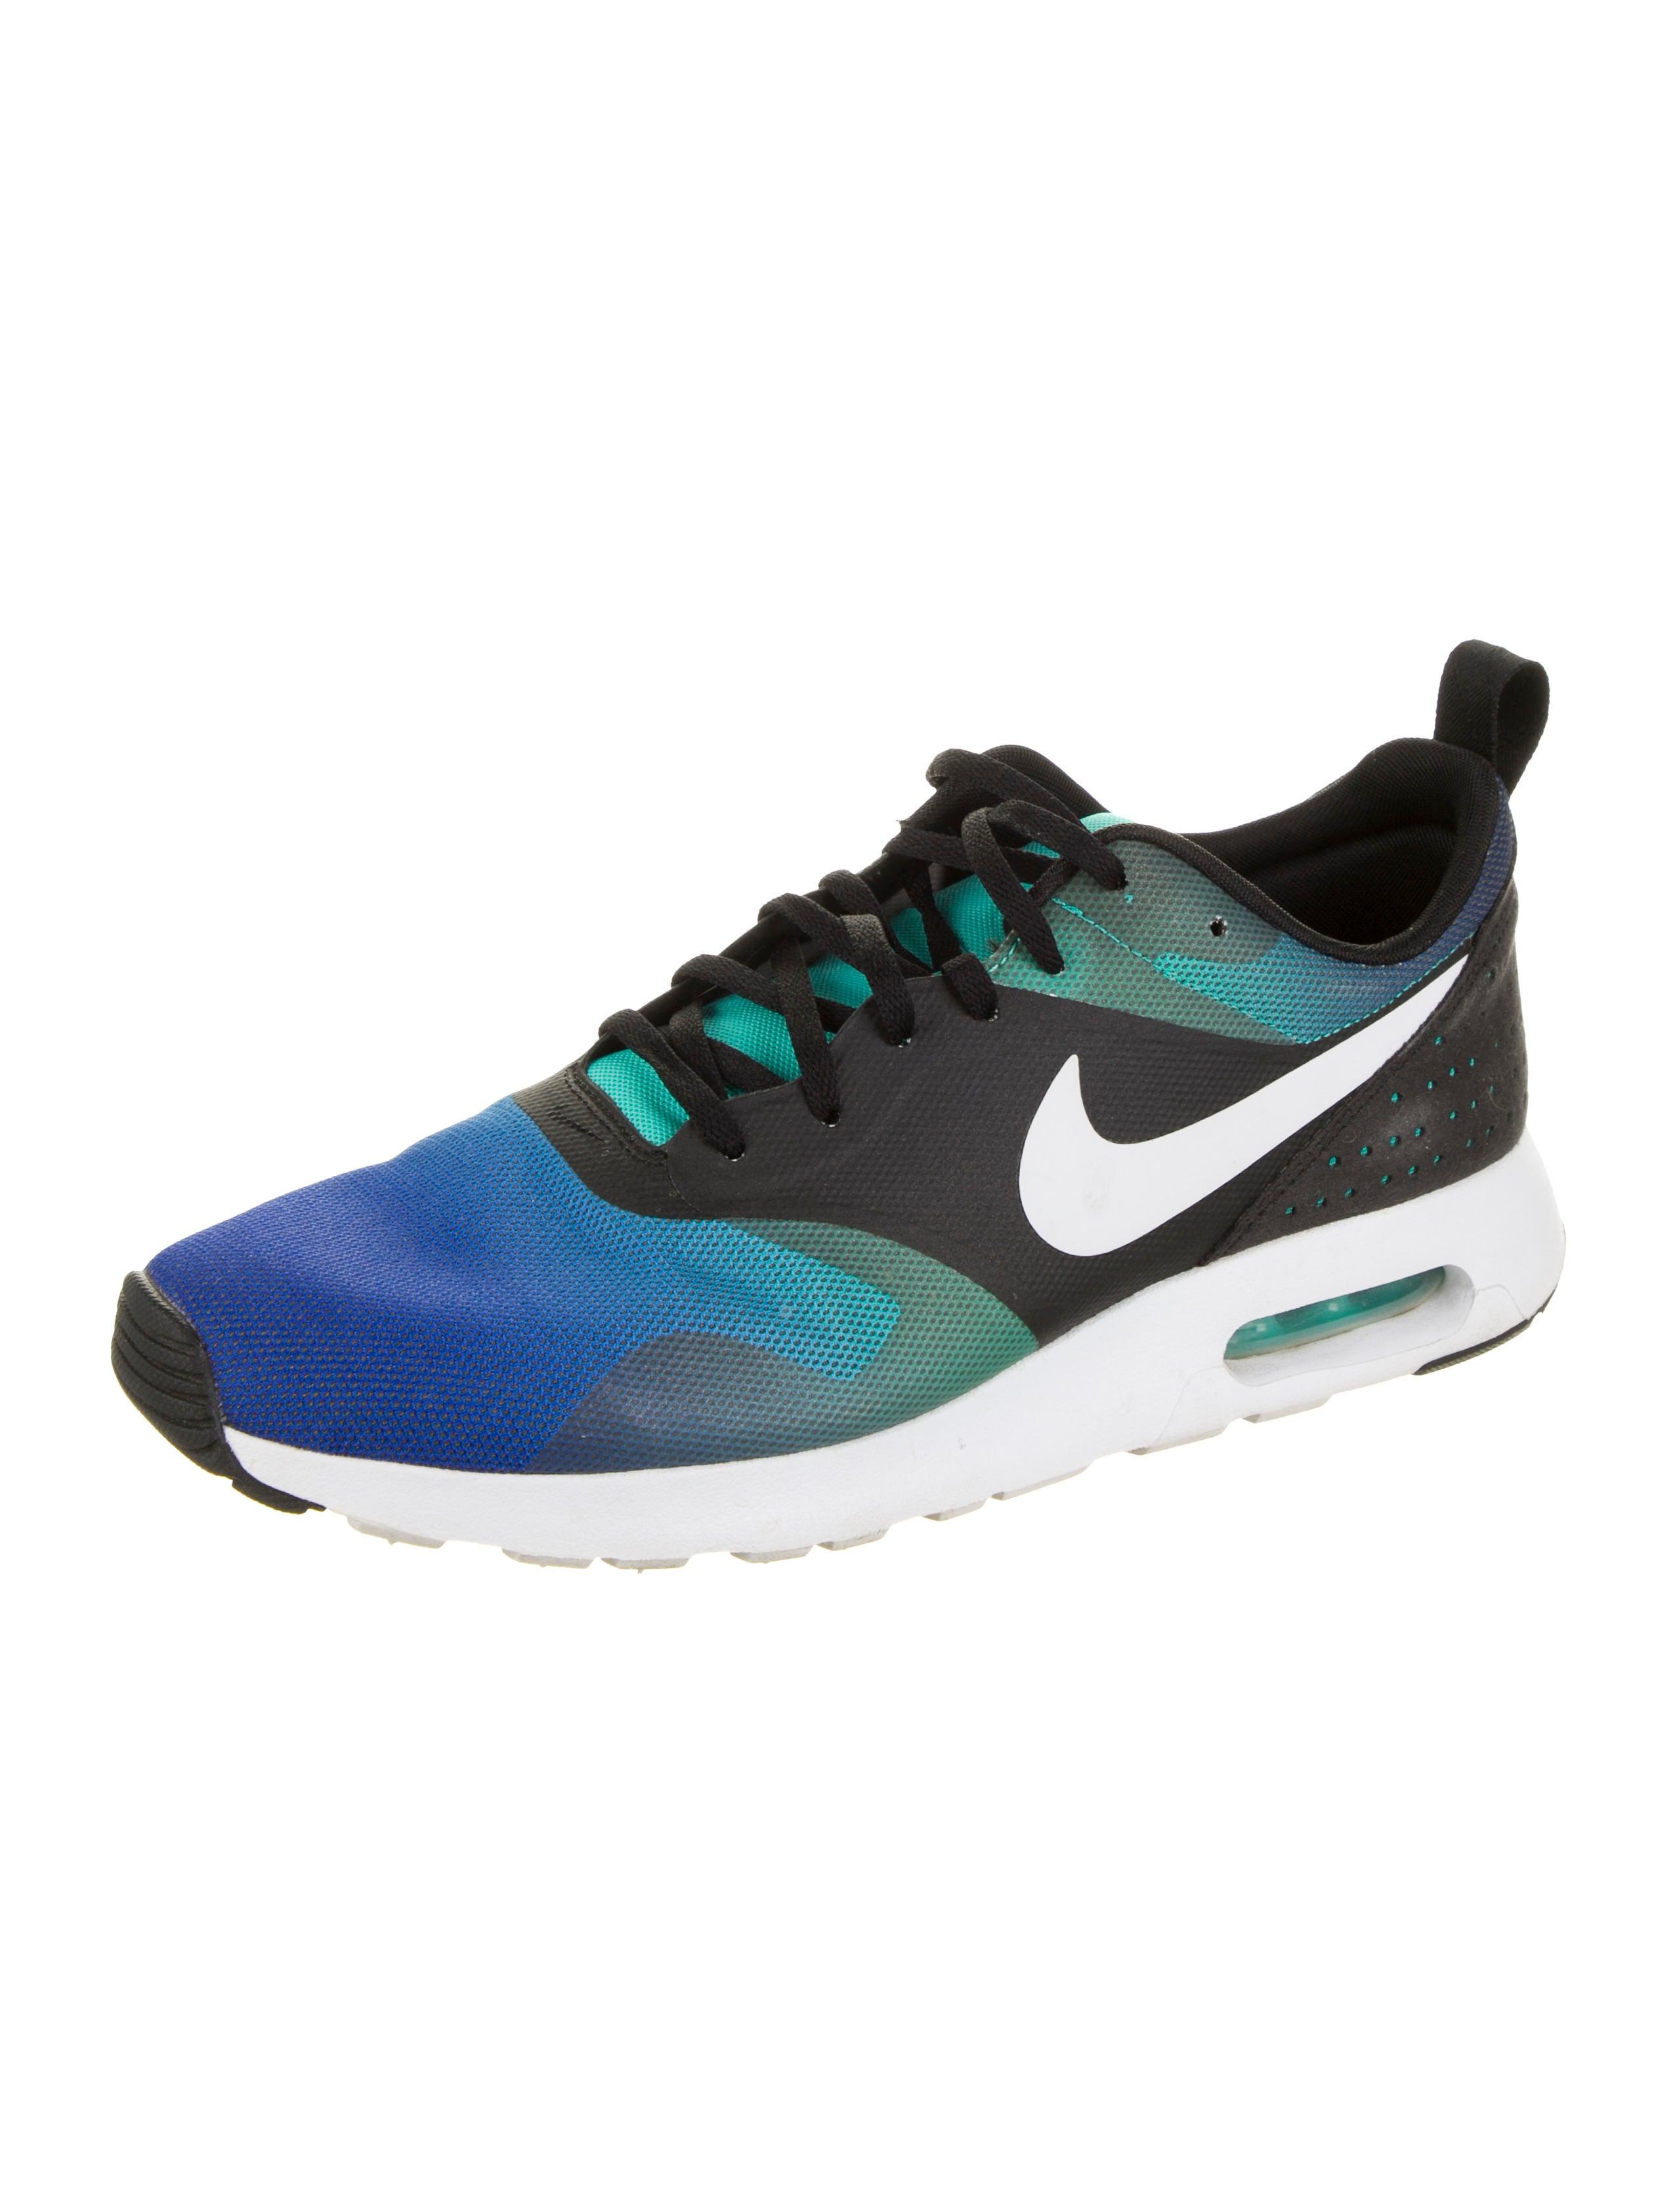 Nike Air Max Tavas Print Blue Gradient